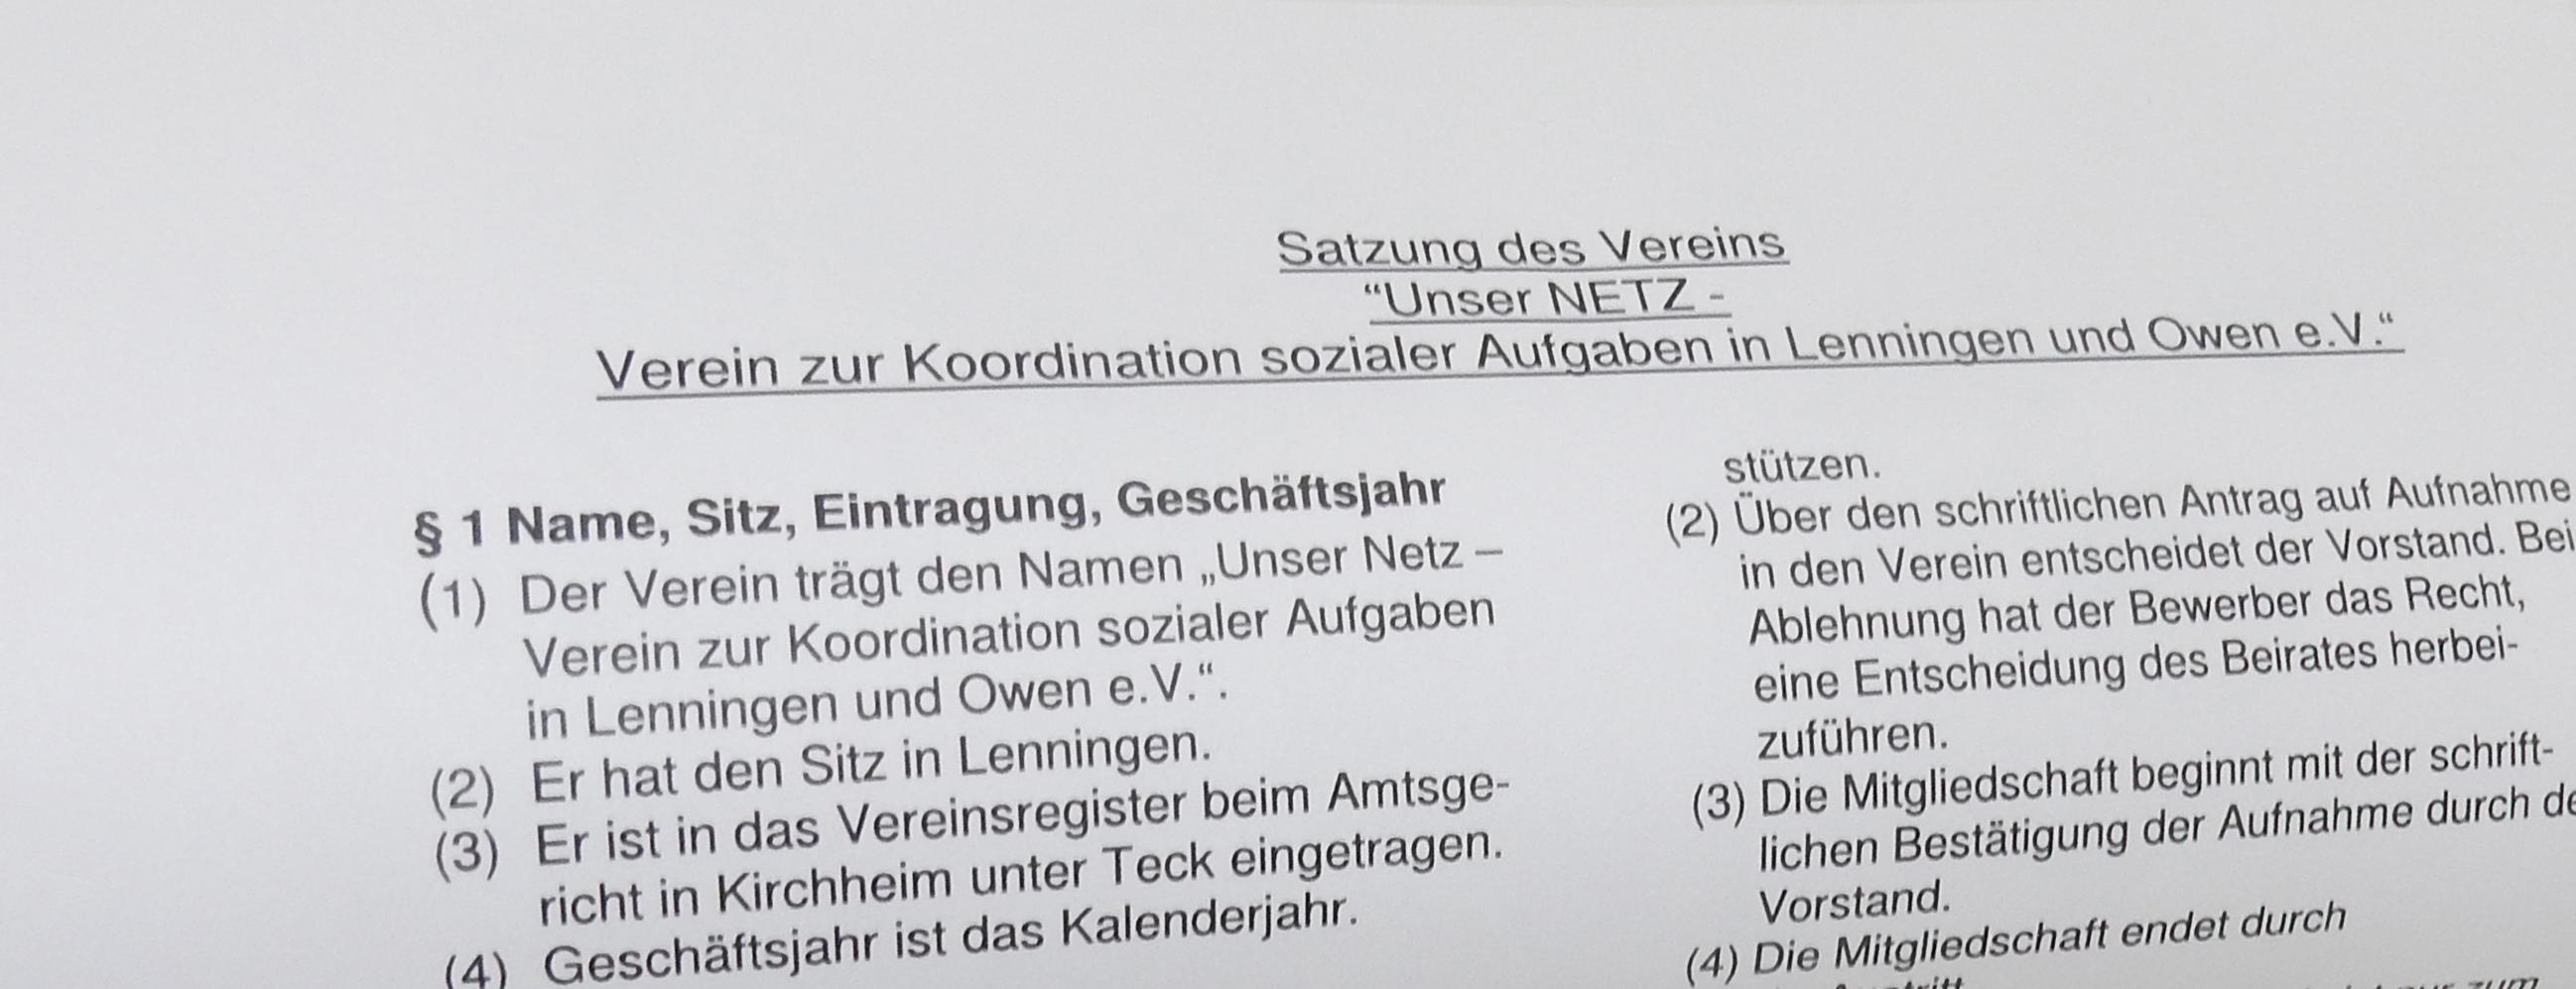 Satzung Unser NETZ